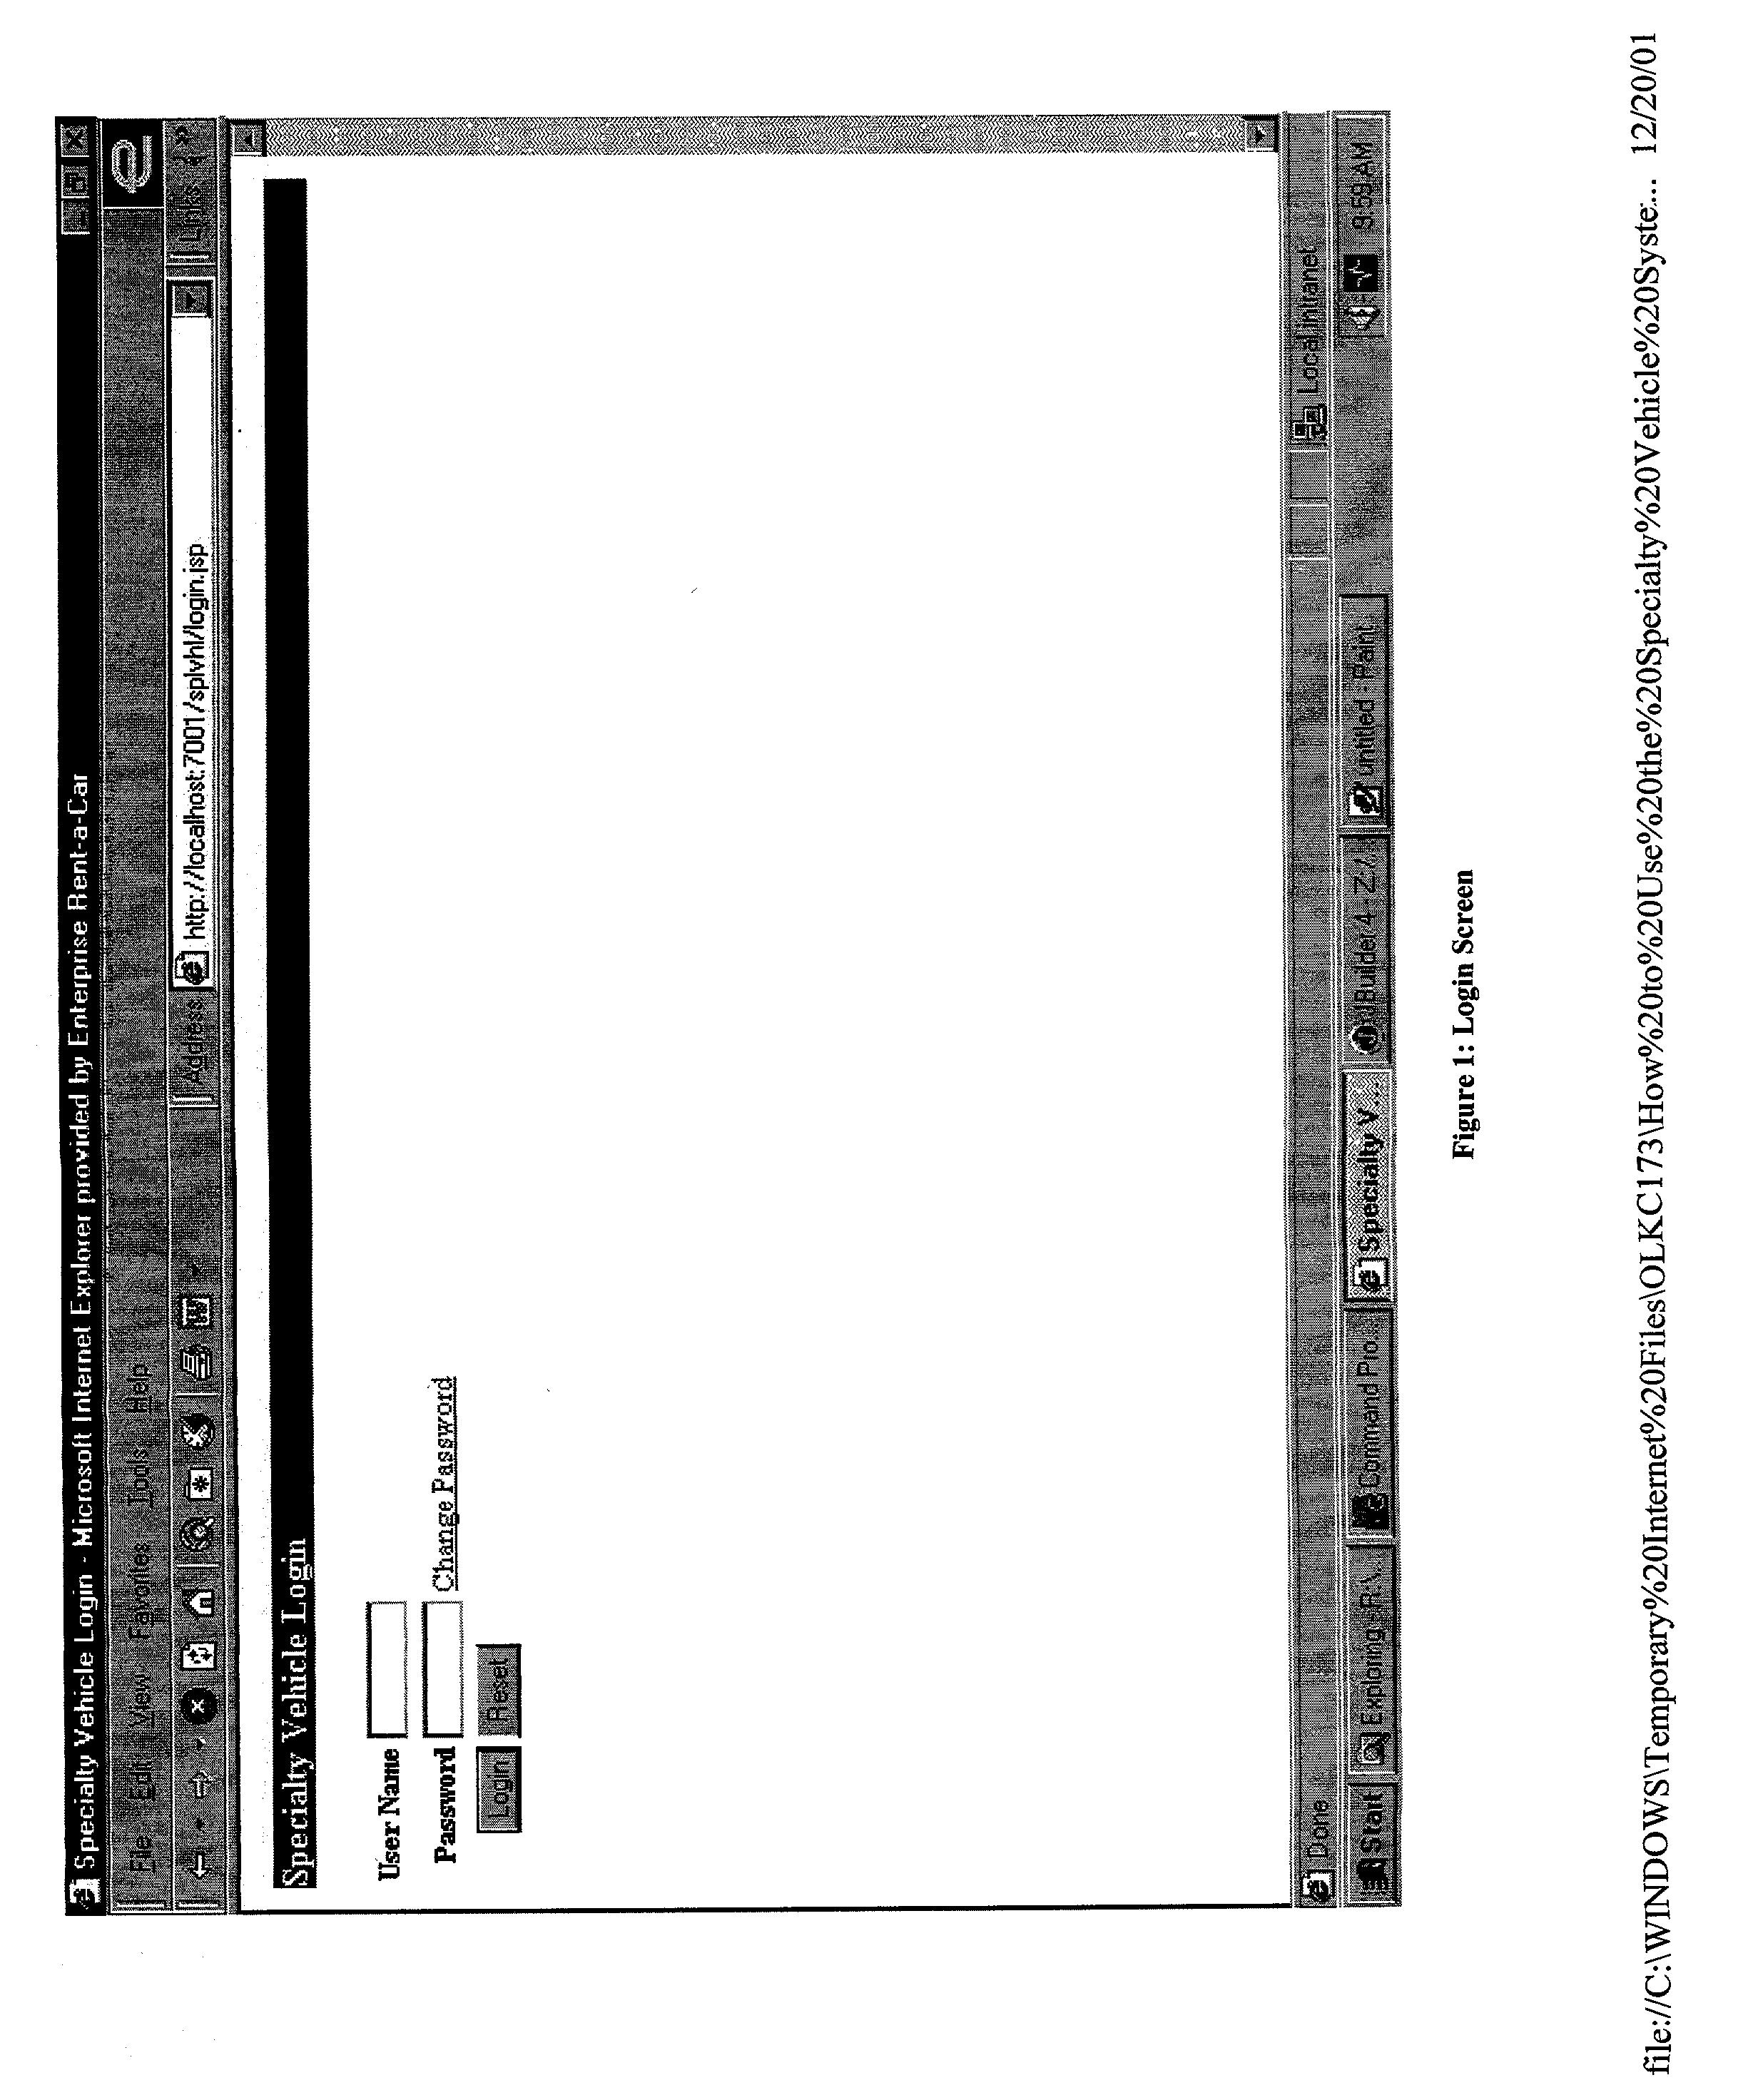 Figure US20030125992A1-20030703-P00003